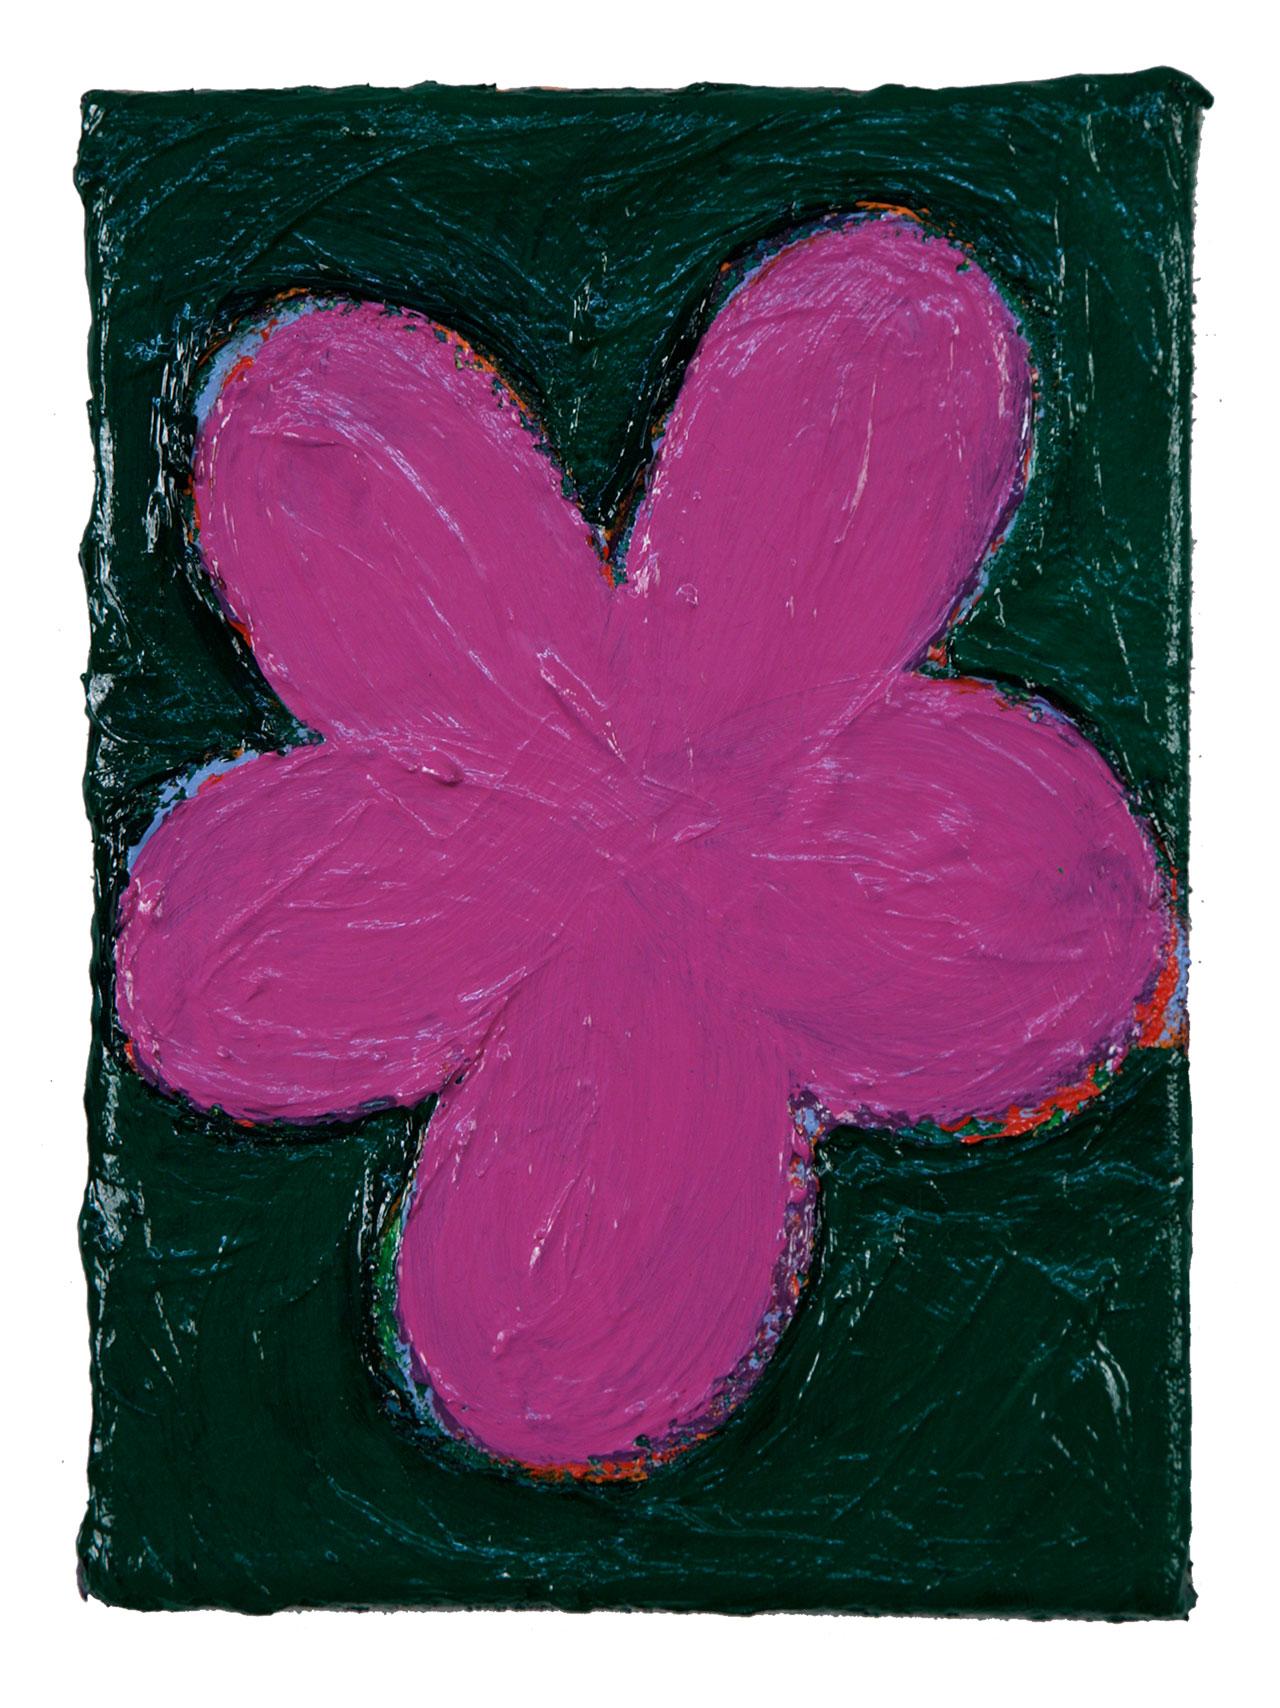 25 Flowers 19 | 2008 © Kerstin Jeckel | MEMORY-PROJEKT # extra